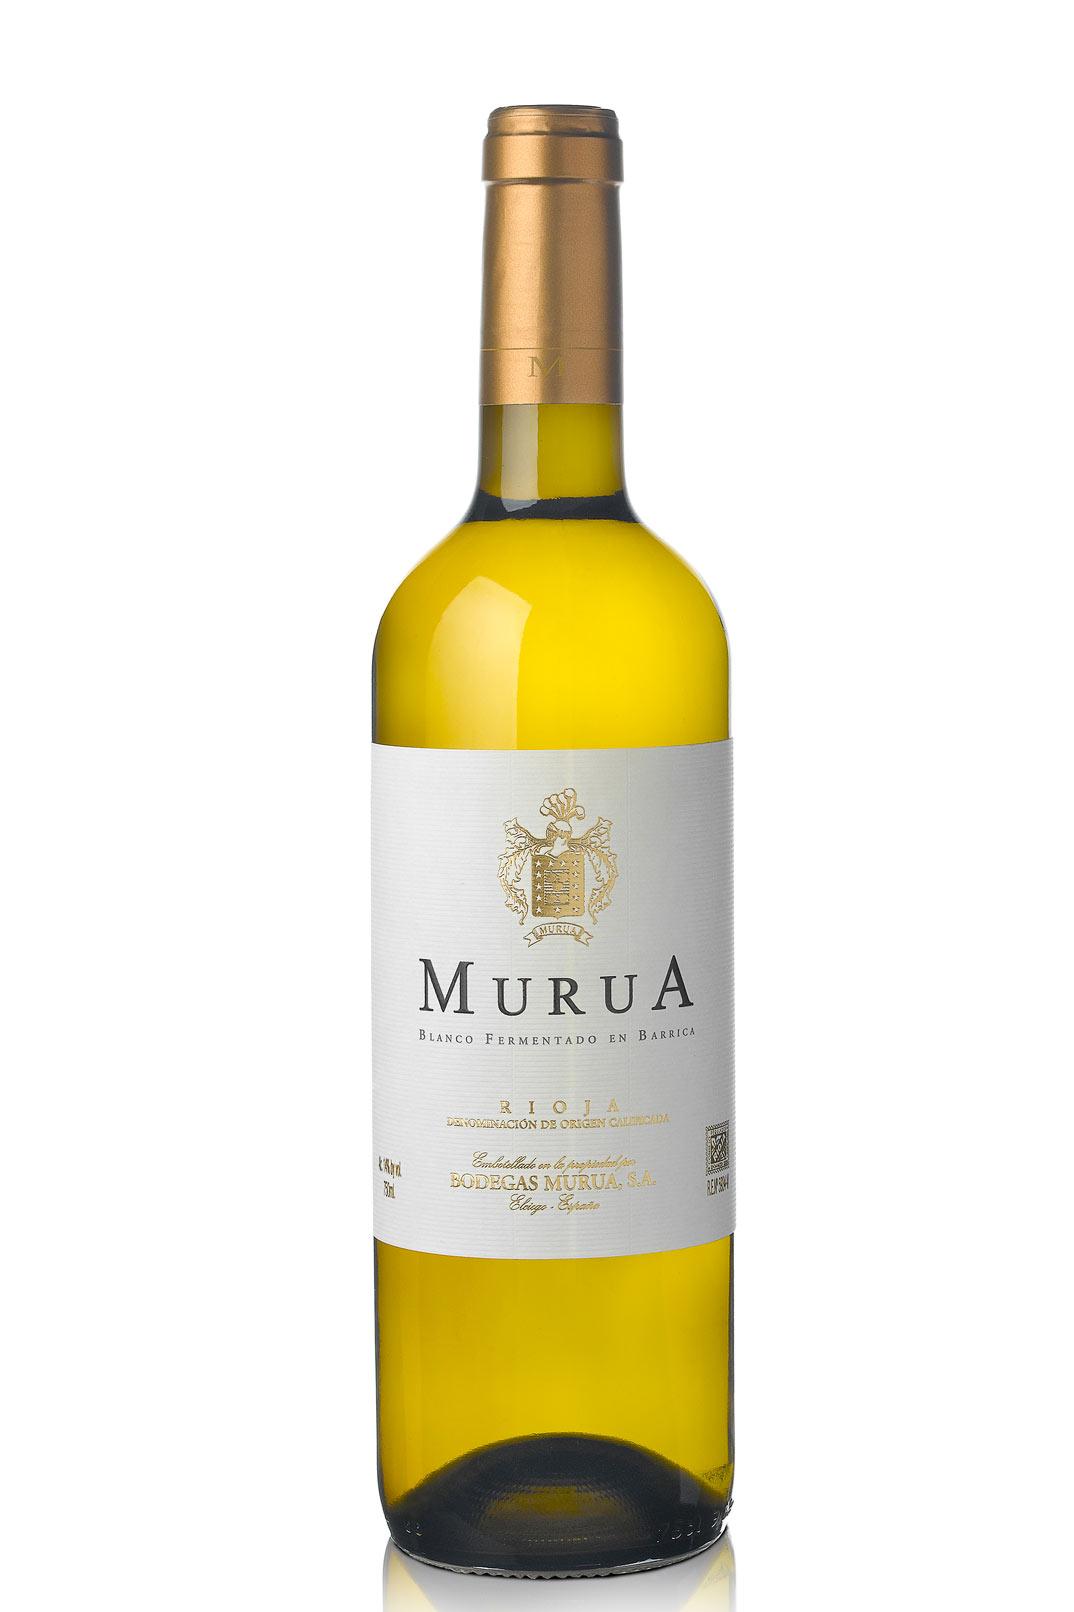 Murua-Blanco-Fermentado-en-Barrica